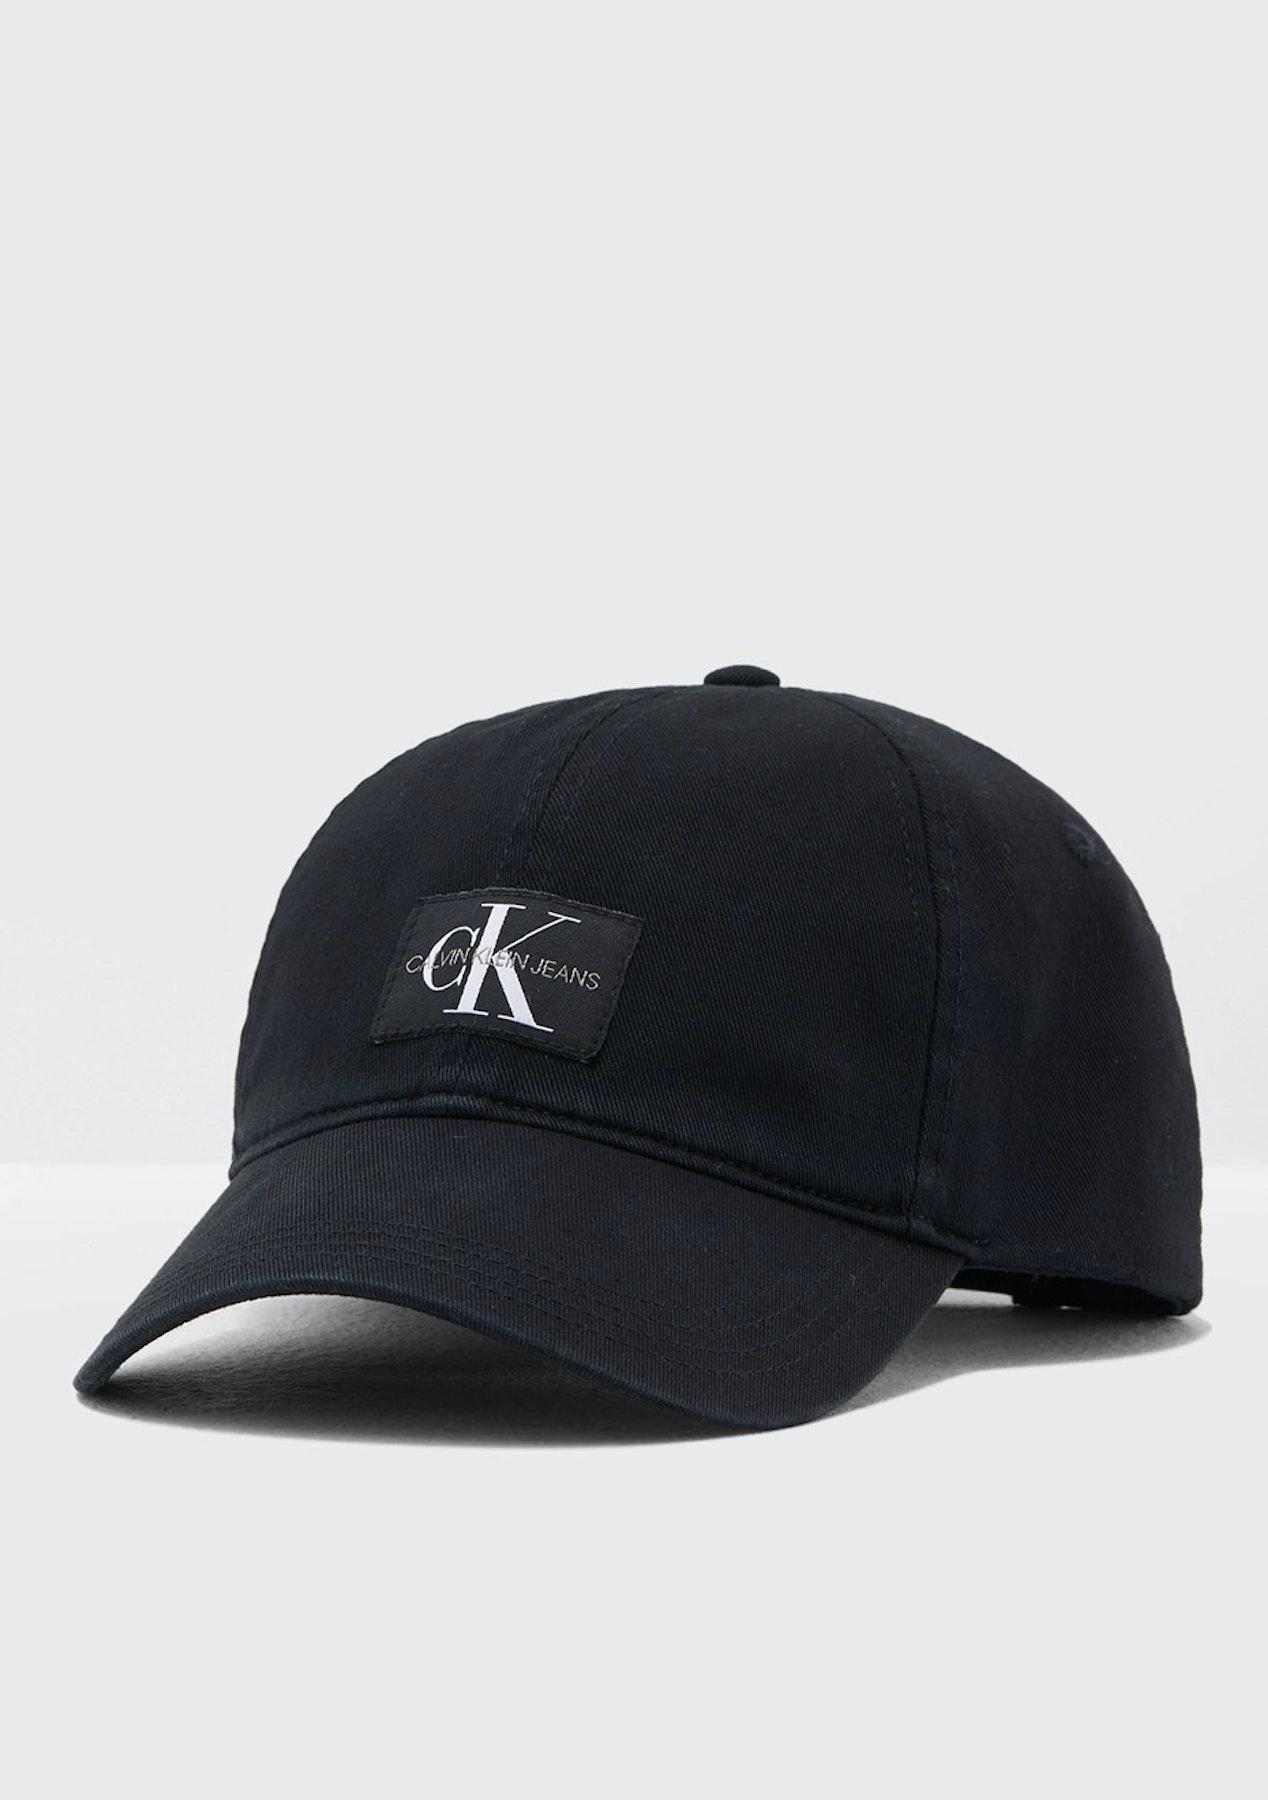 4864d0bff84 Calvin Klein - J Monogram Cap W - Black Beauty - Calvin Klein Restock -  Onceit